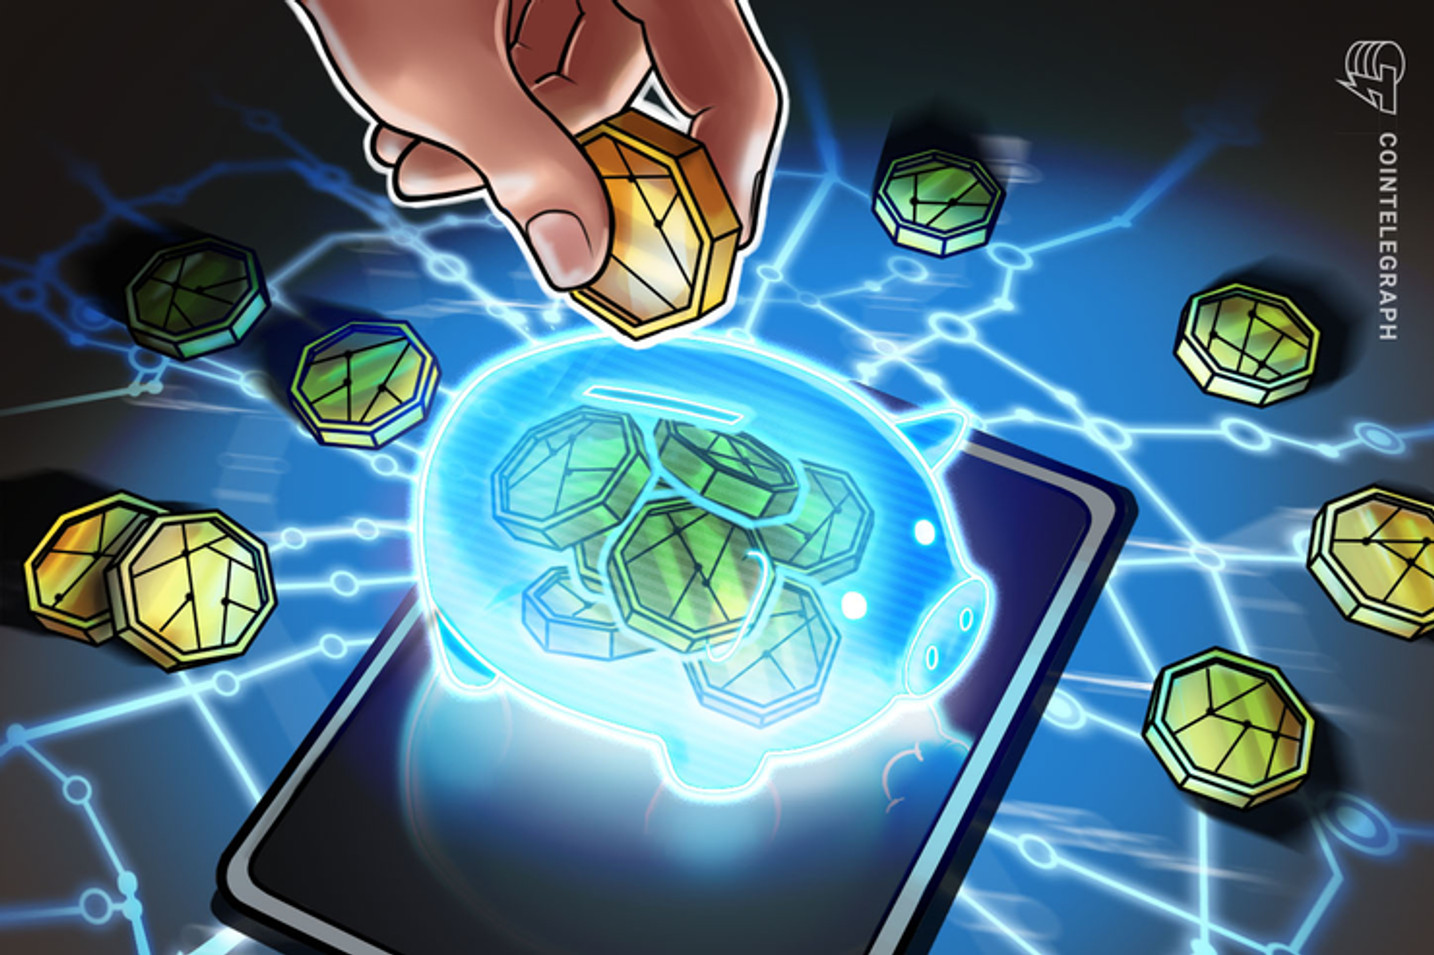 Recife sediará evento de blockchain neste final de semana